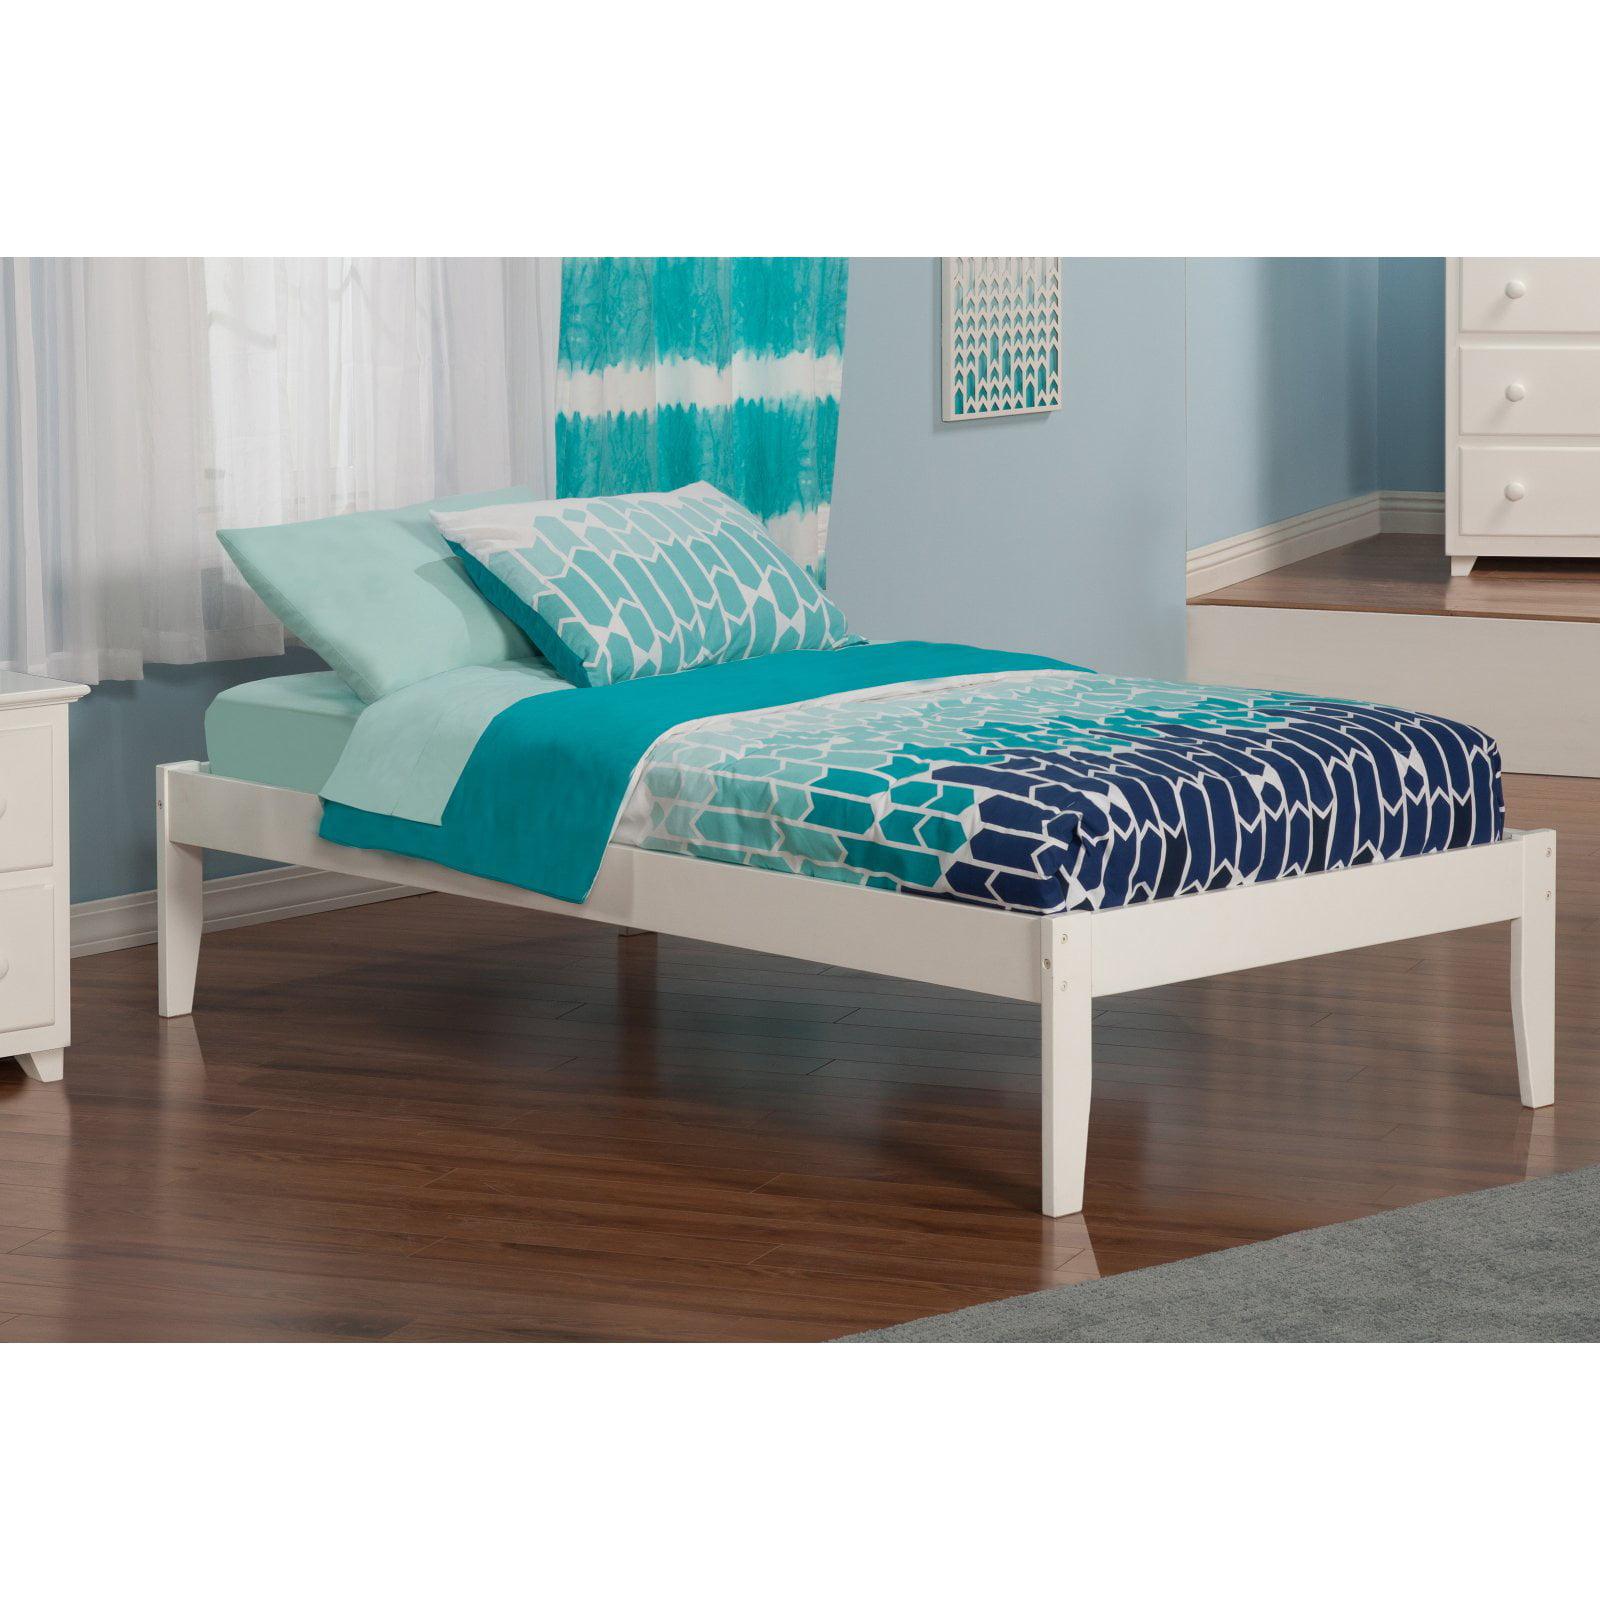 Atlantic Urban Lifestyle Concord Platform Bed